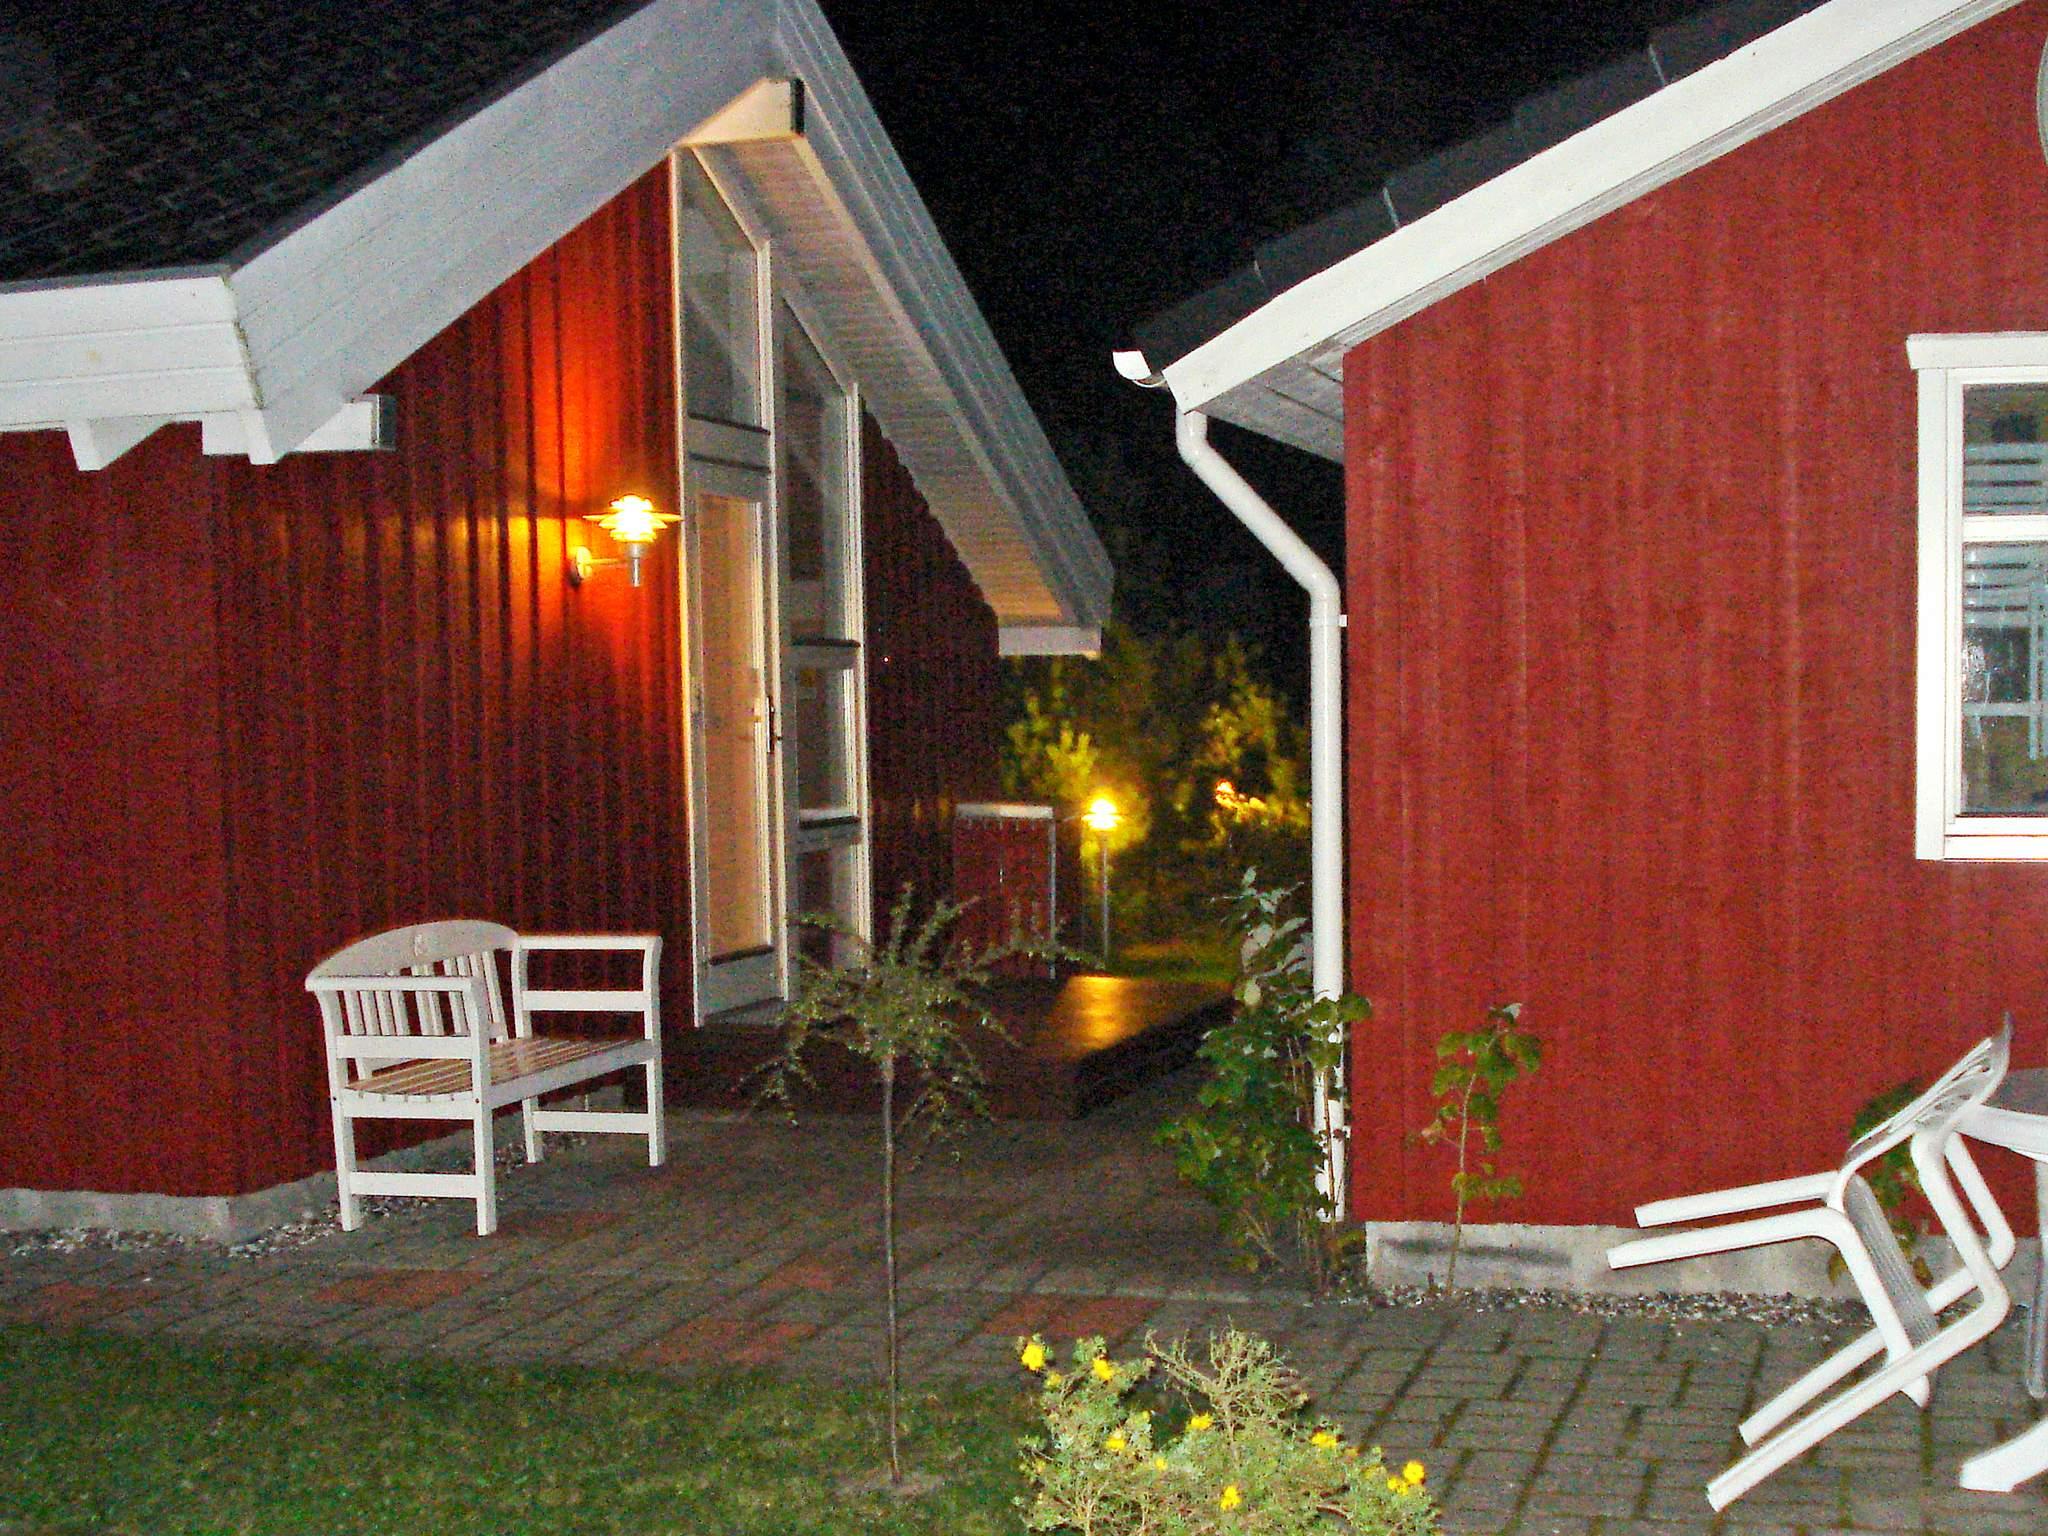 Ferienhaus Øster Hurup (83254), Øster Hurup, , Ostjütland, Dänemark, Bild 23